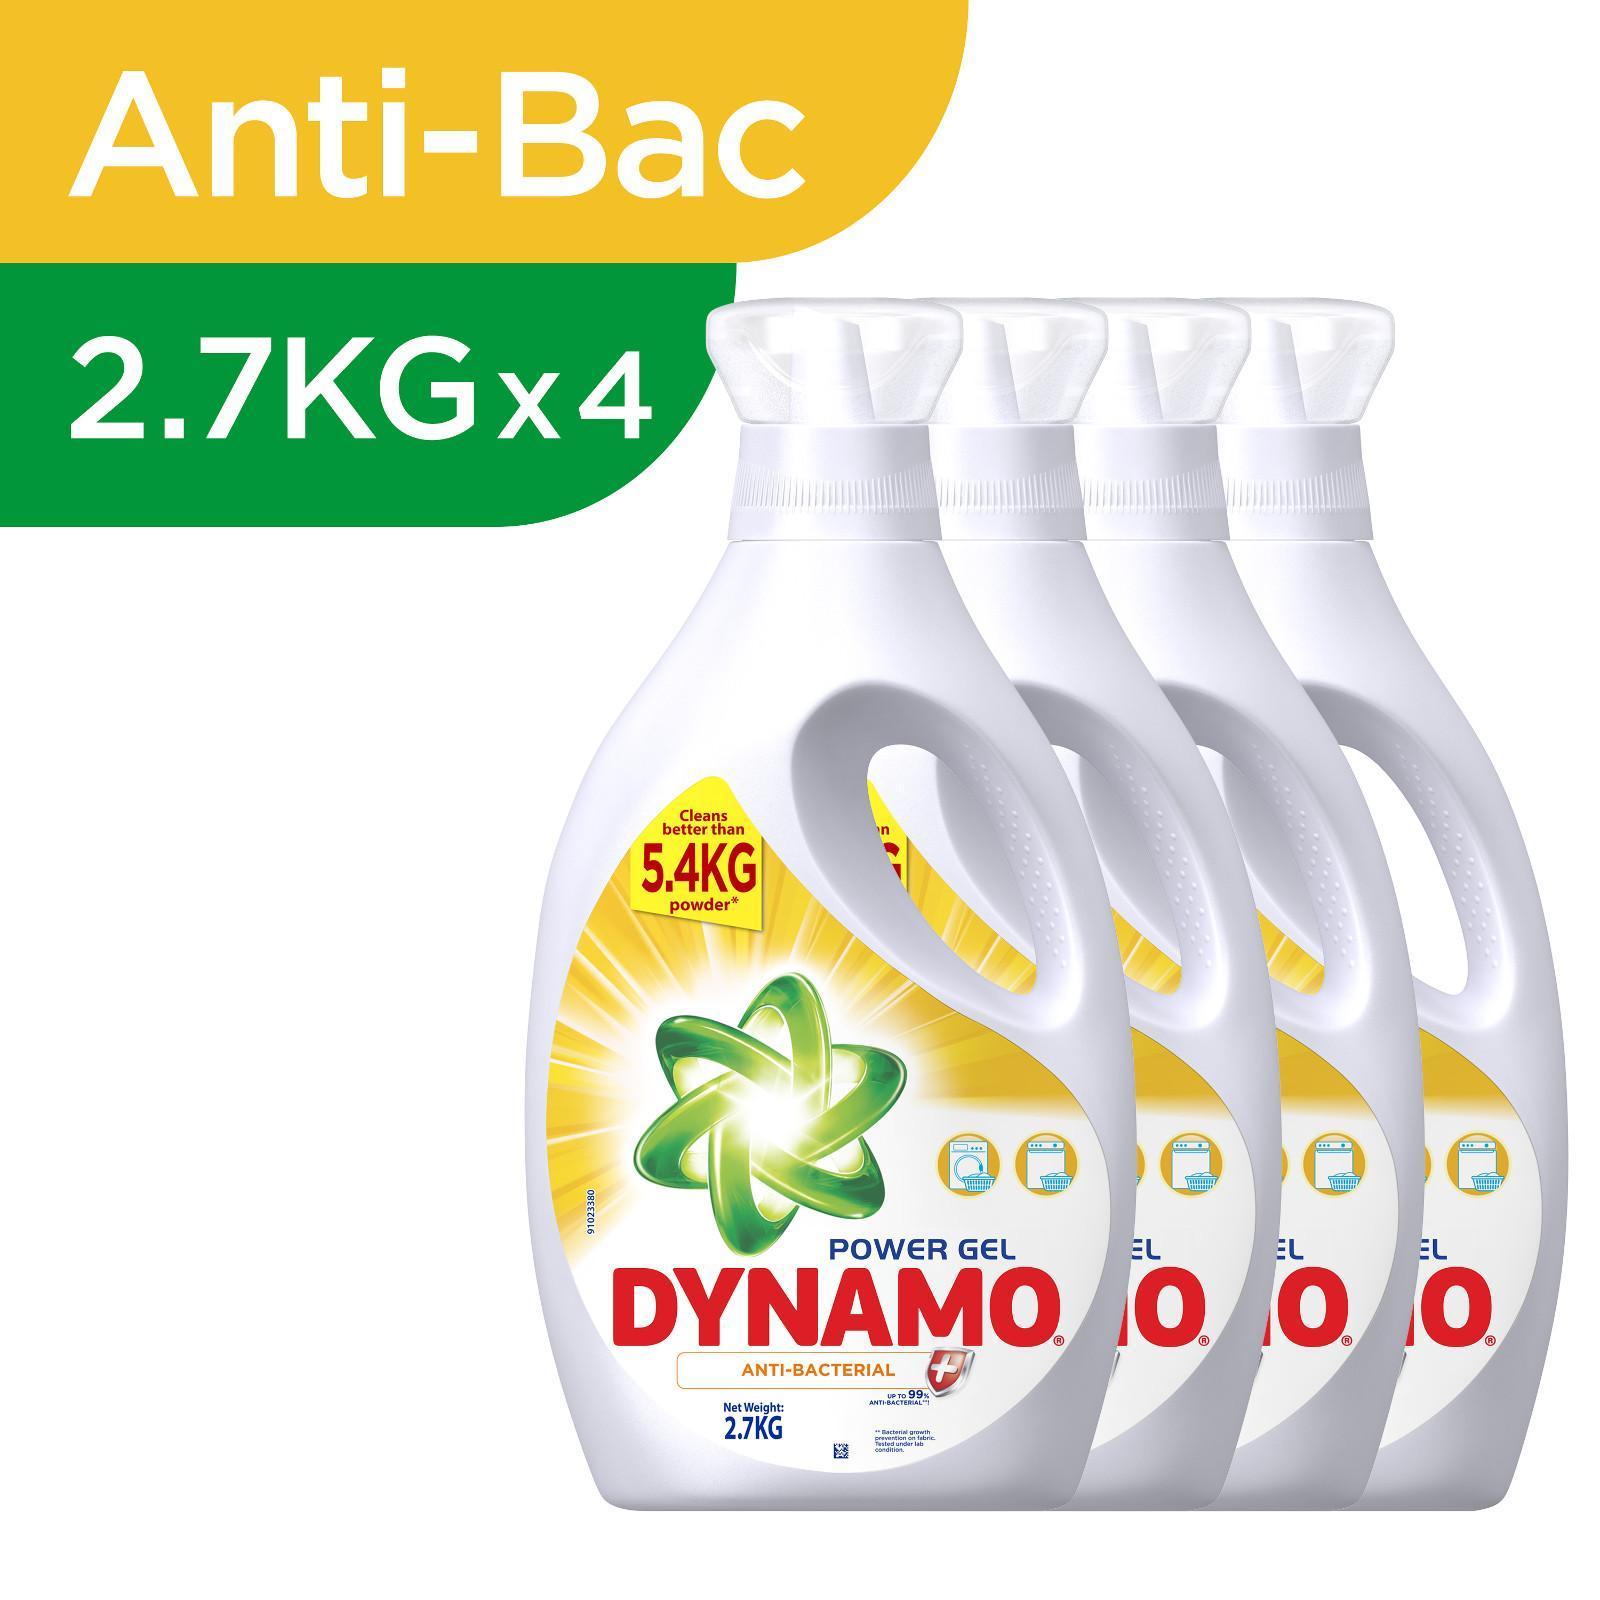 Dynamo Power Gel Anti-Bacterial Laundry Detergent - Case